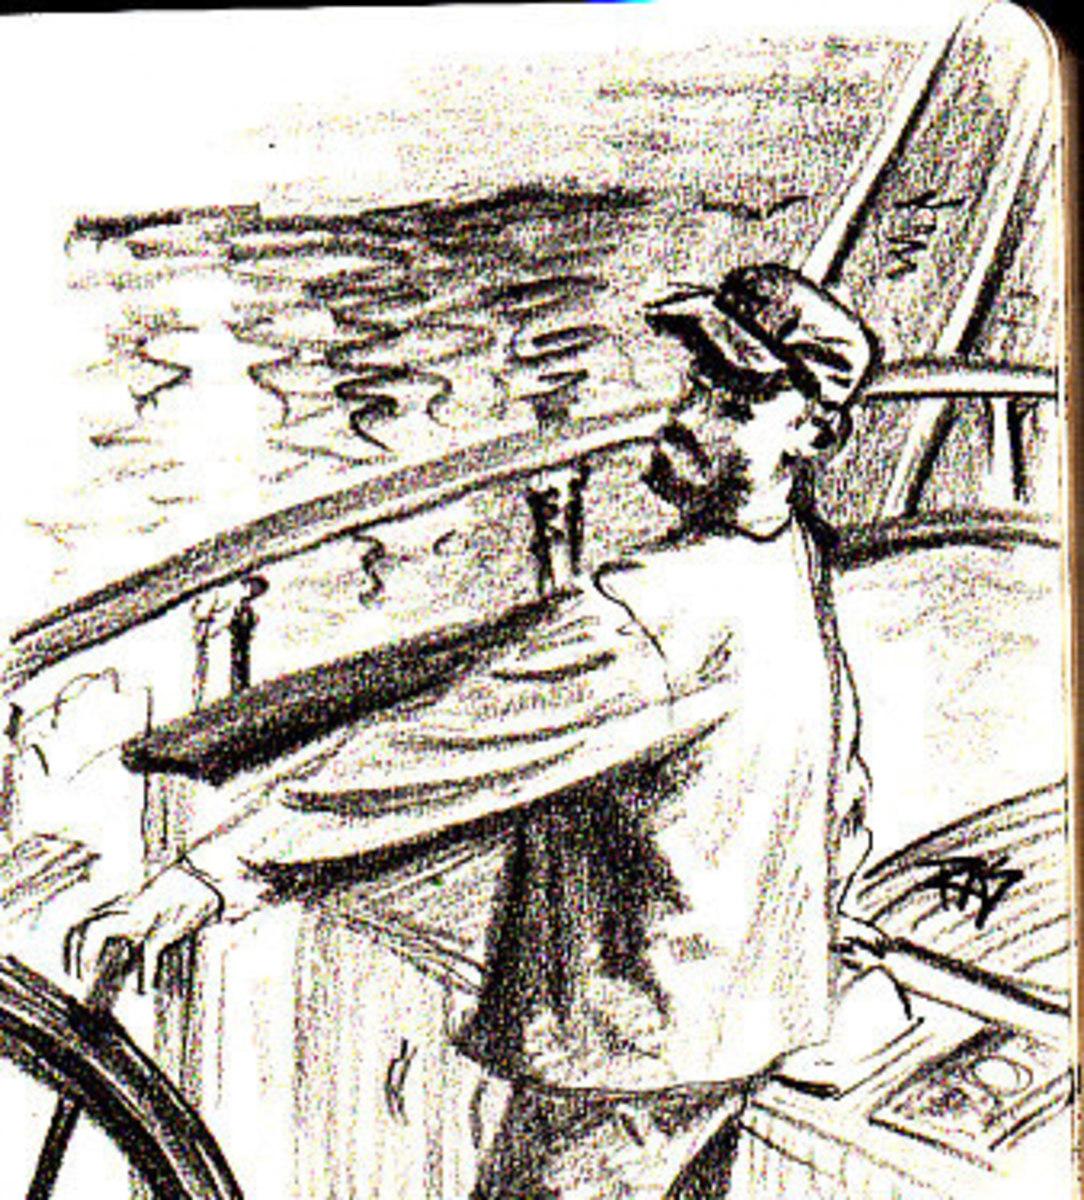 """The Boater"" 9B graphite pencil on Moleskine sketchbook, Robert A. Sloan"